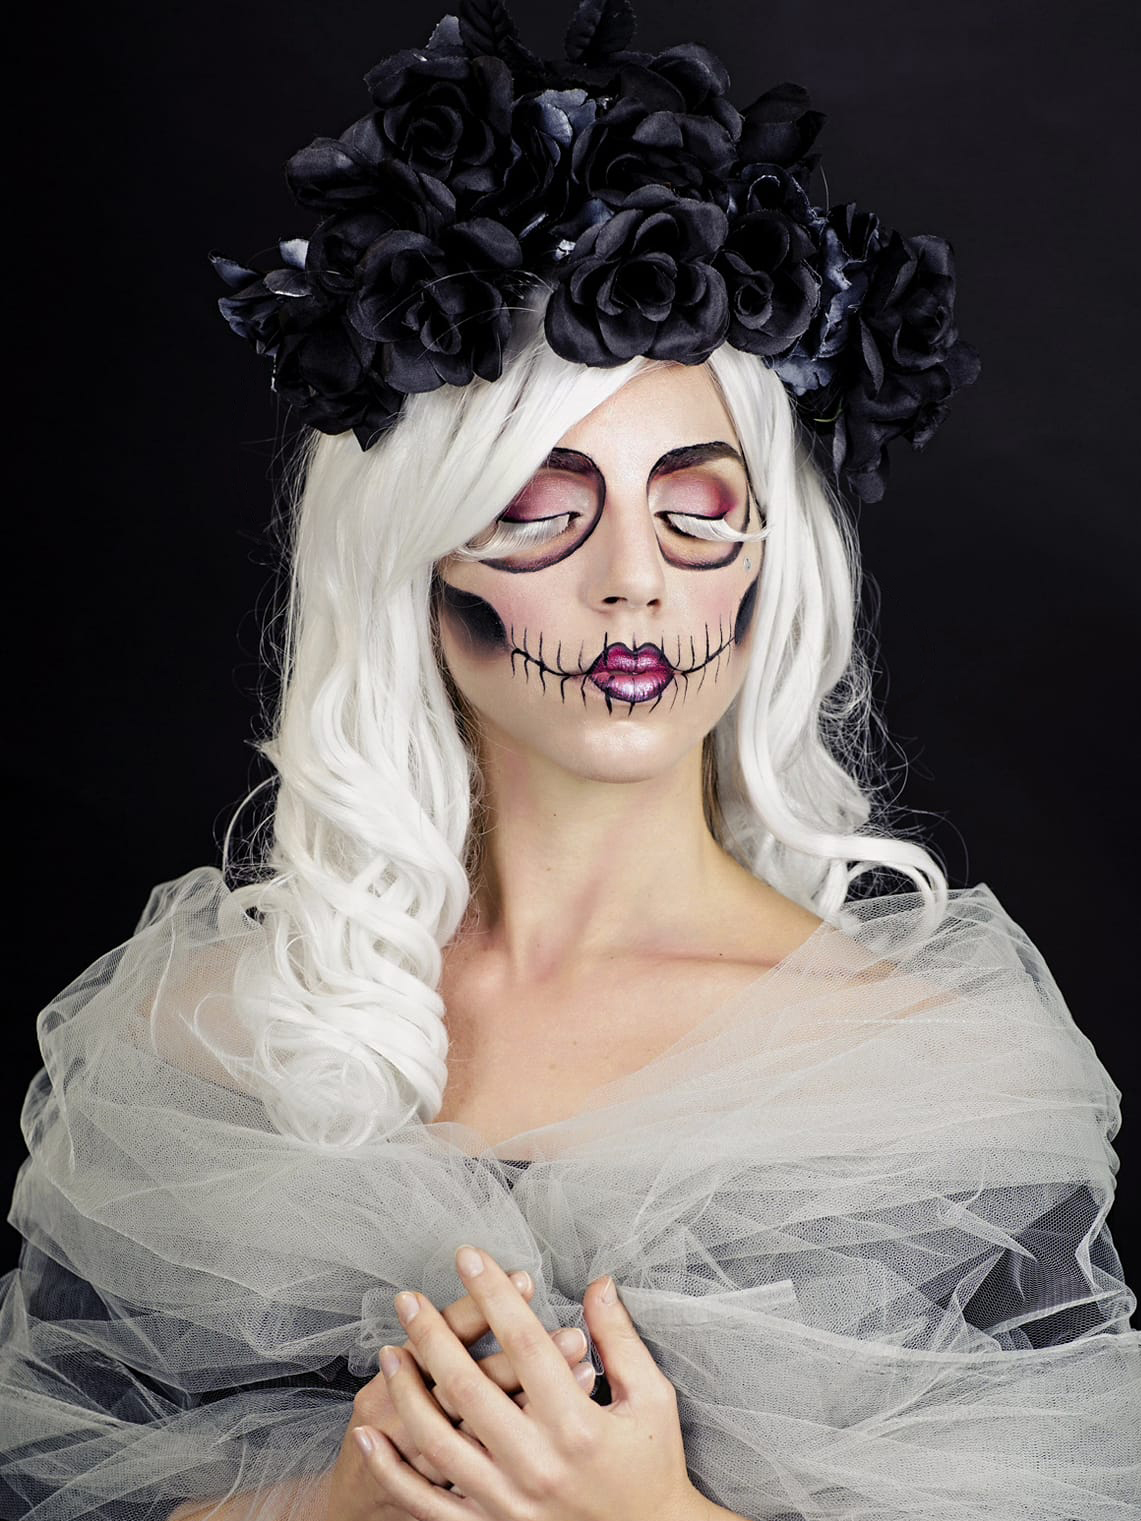 Woman, sugar skull makeup, white wig, black roses, white veil